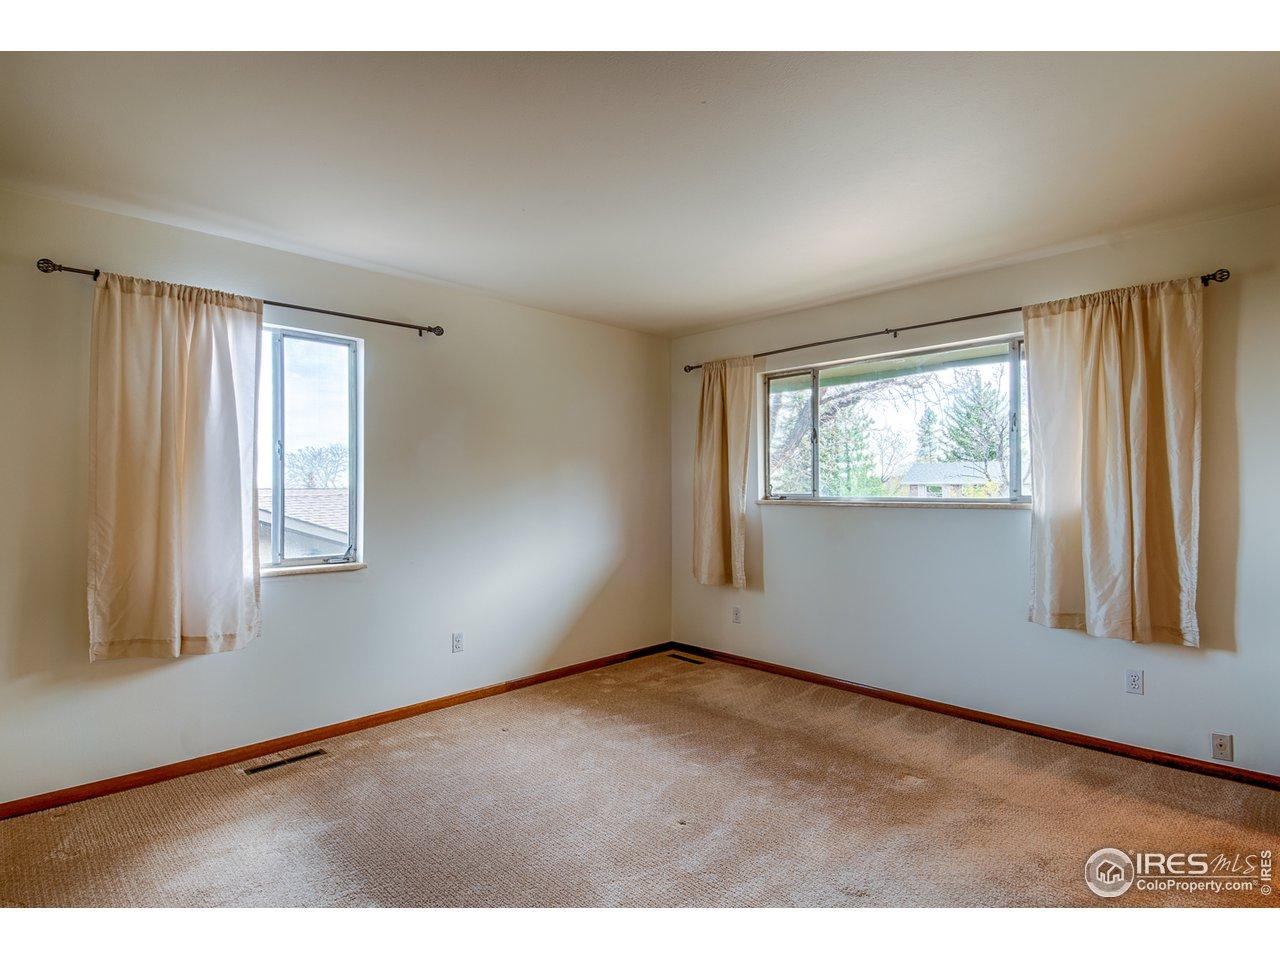 Main floor master bedroom - south & east windows